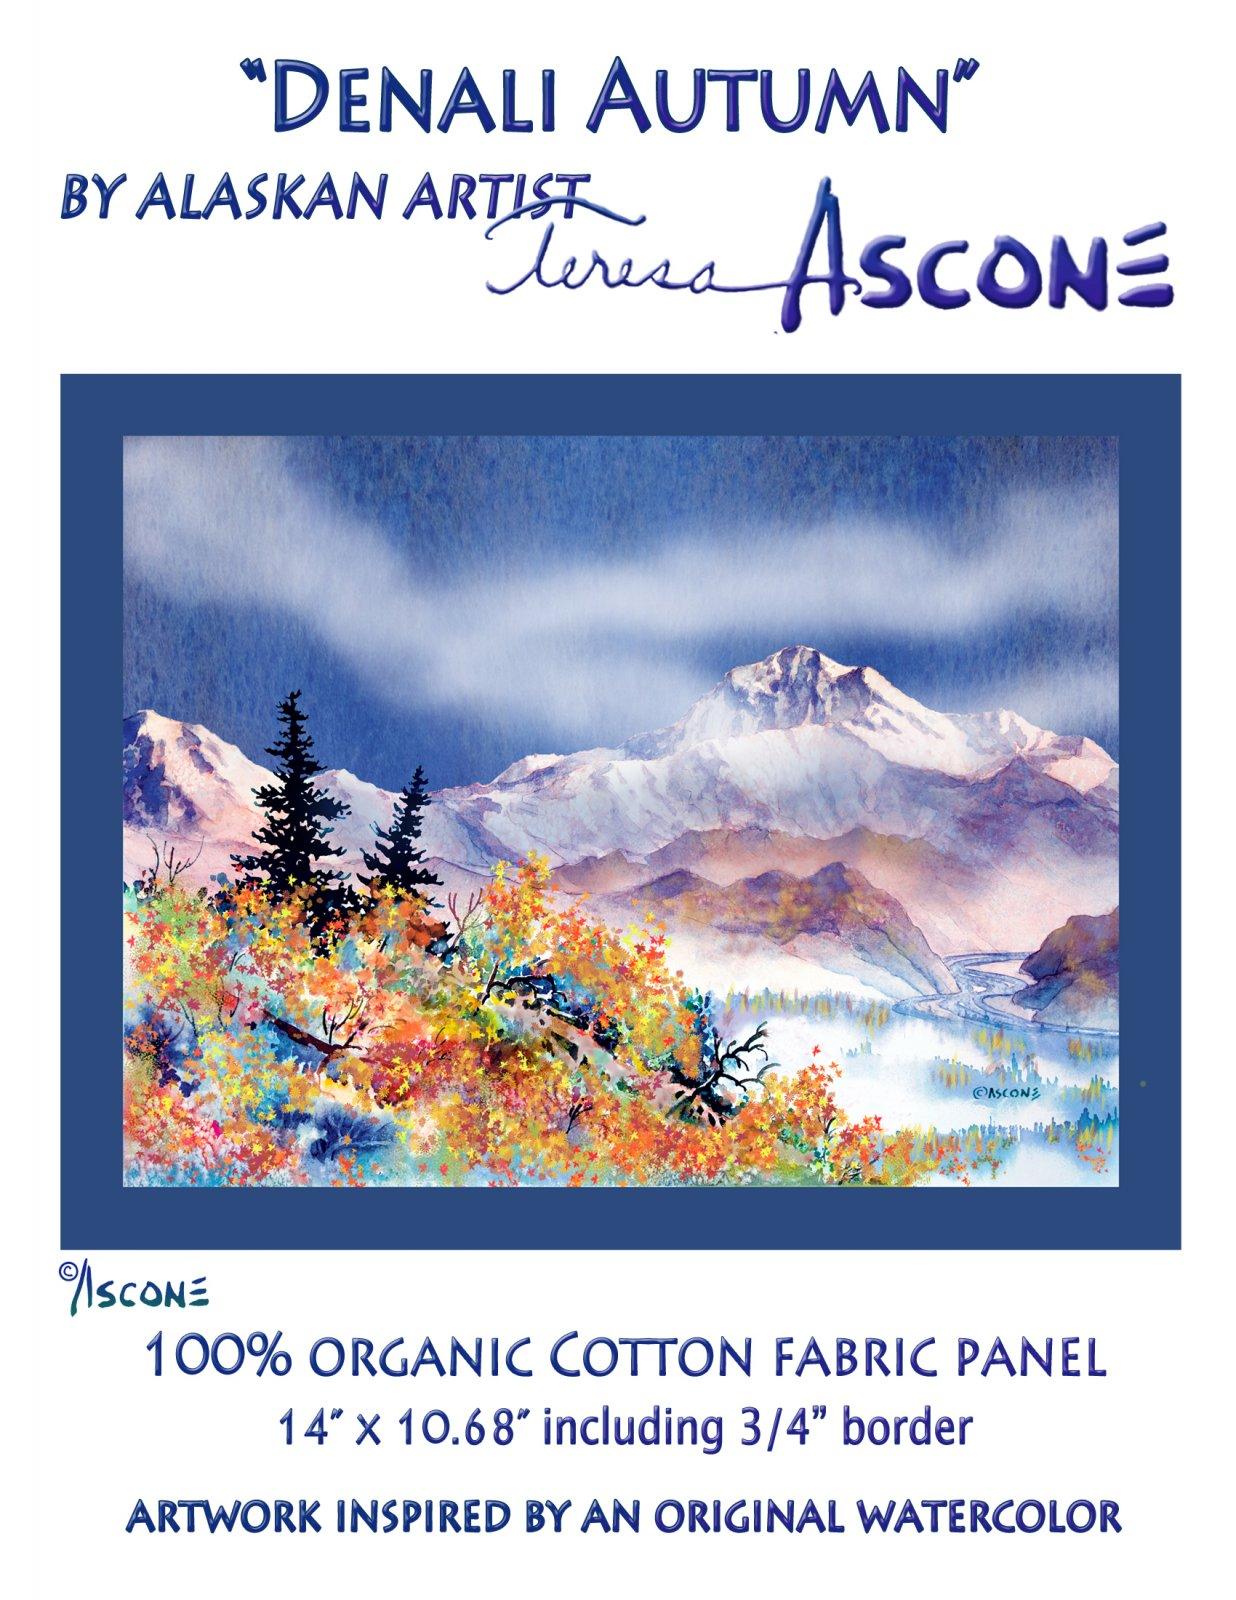 T Ascone Denali Autumn Panel